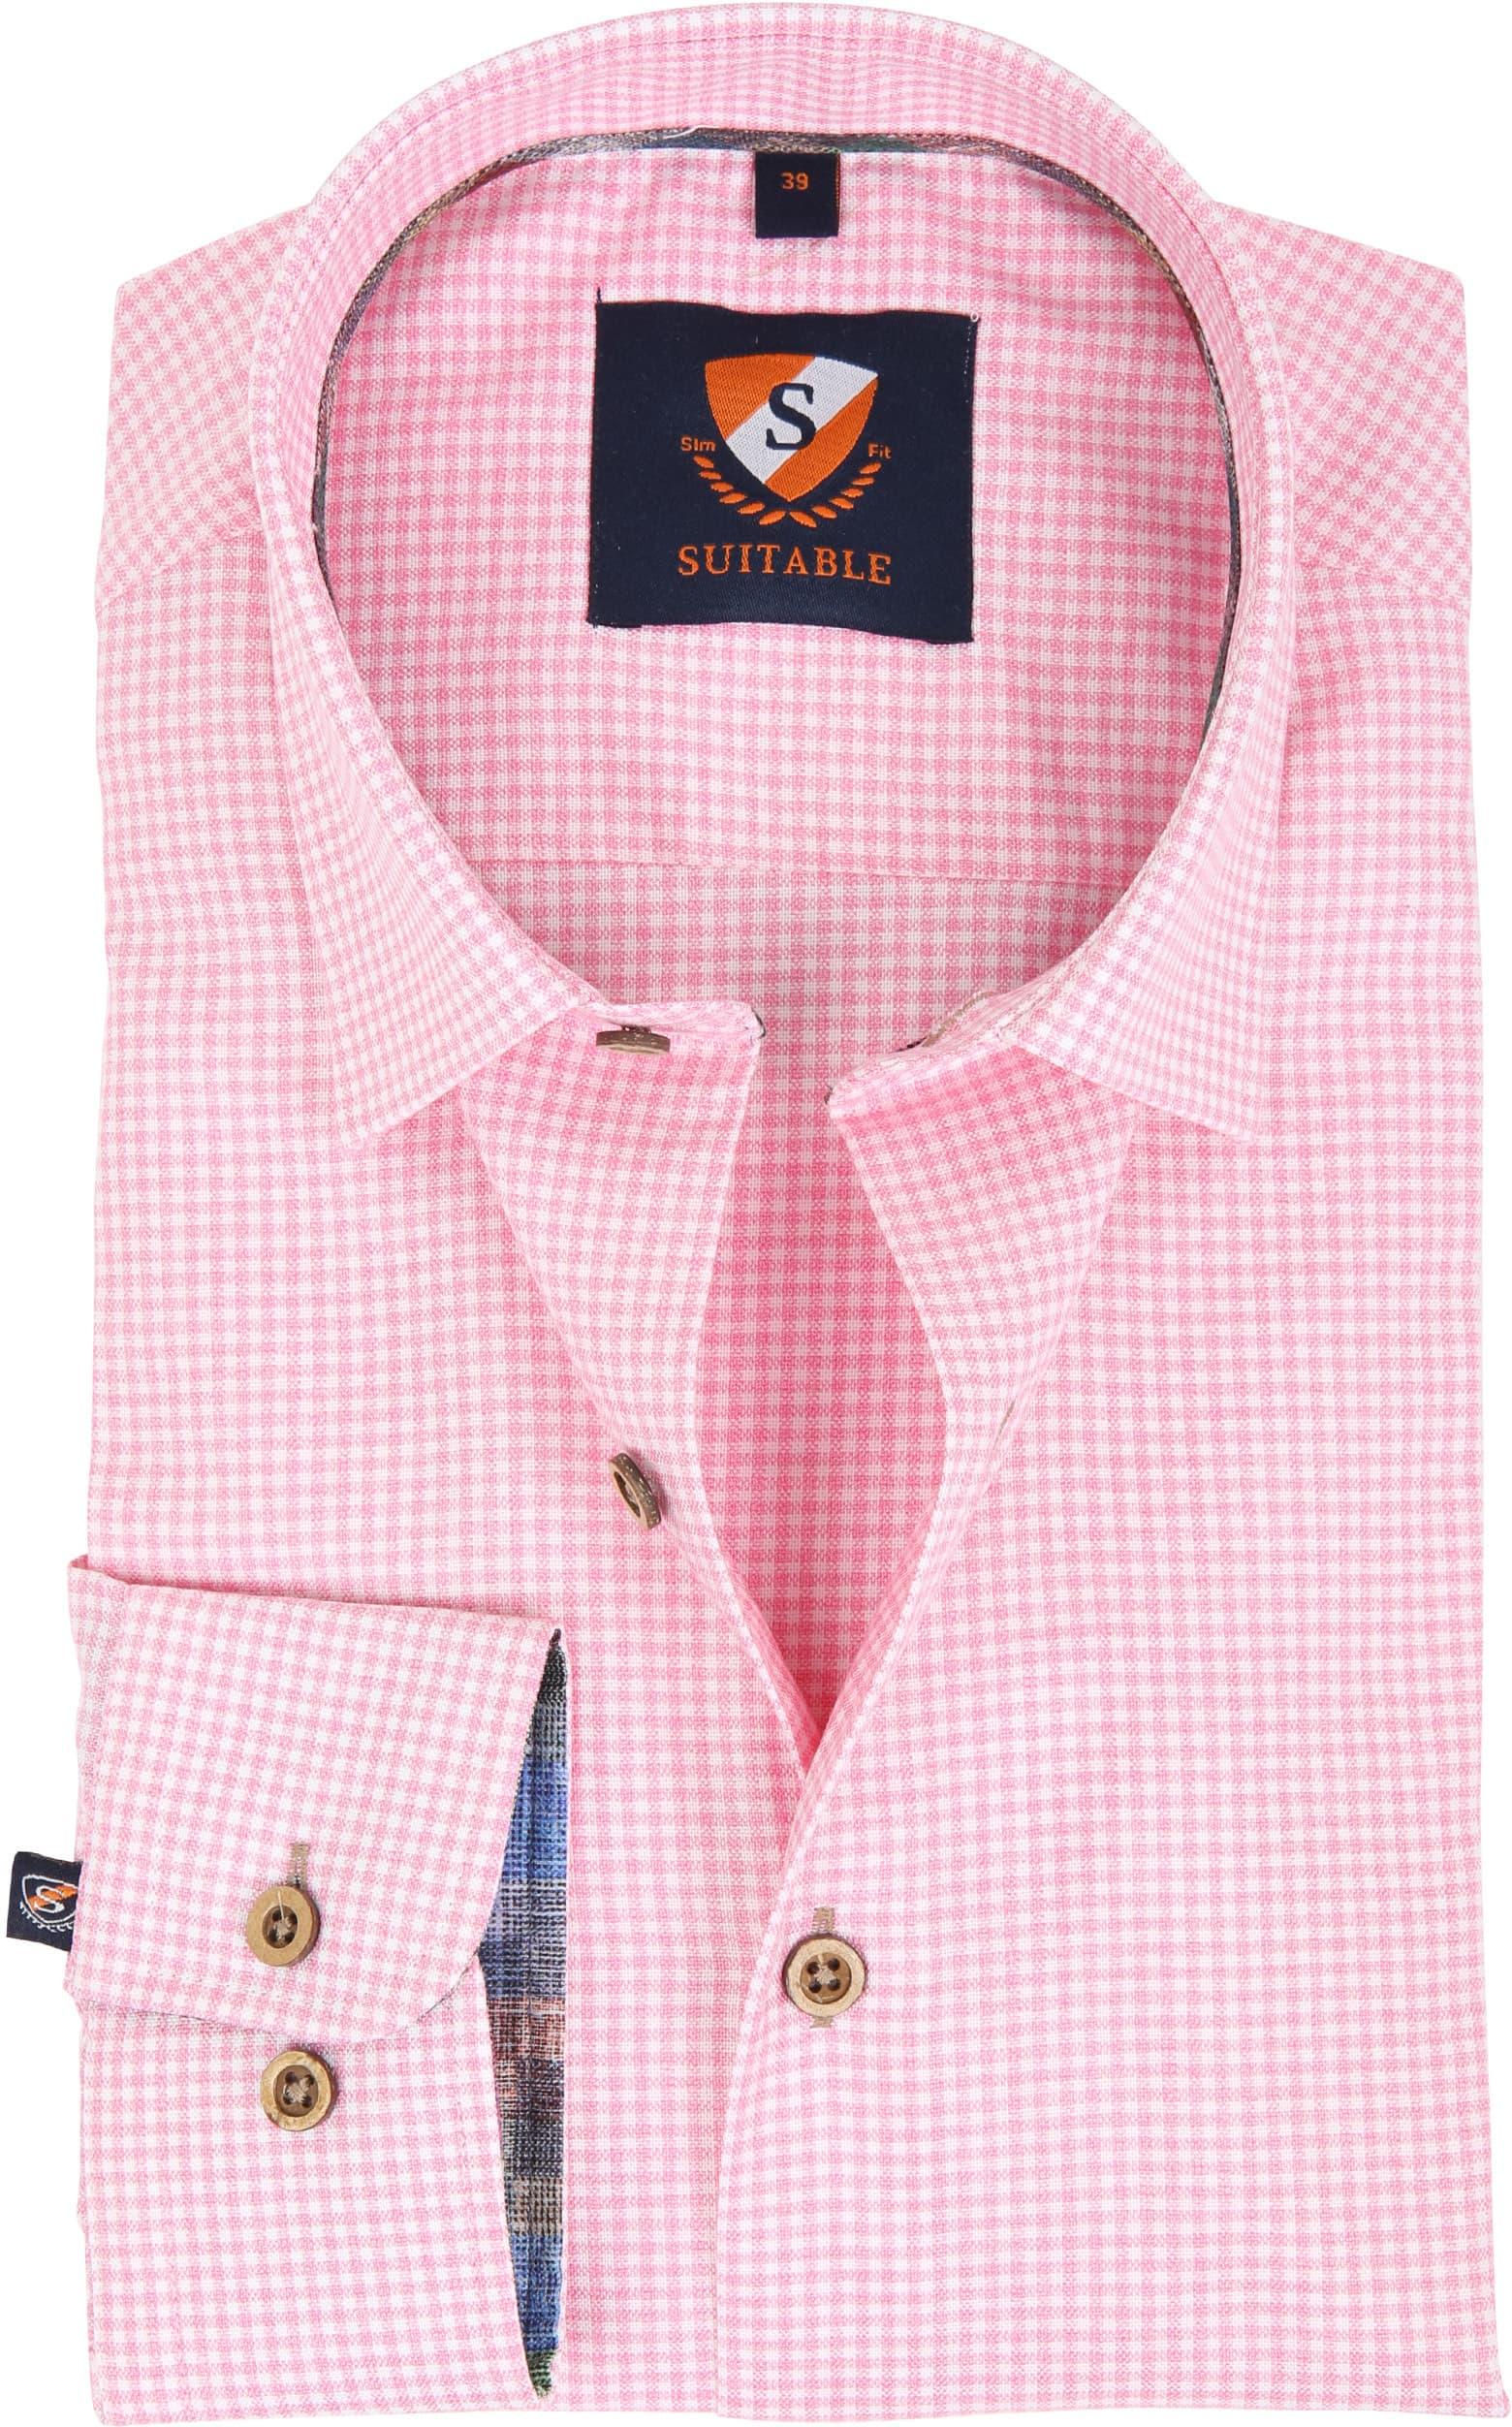 Suitable Overhemd Roze Ruit 181-6 foto 0